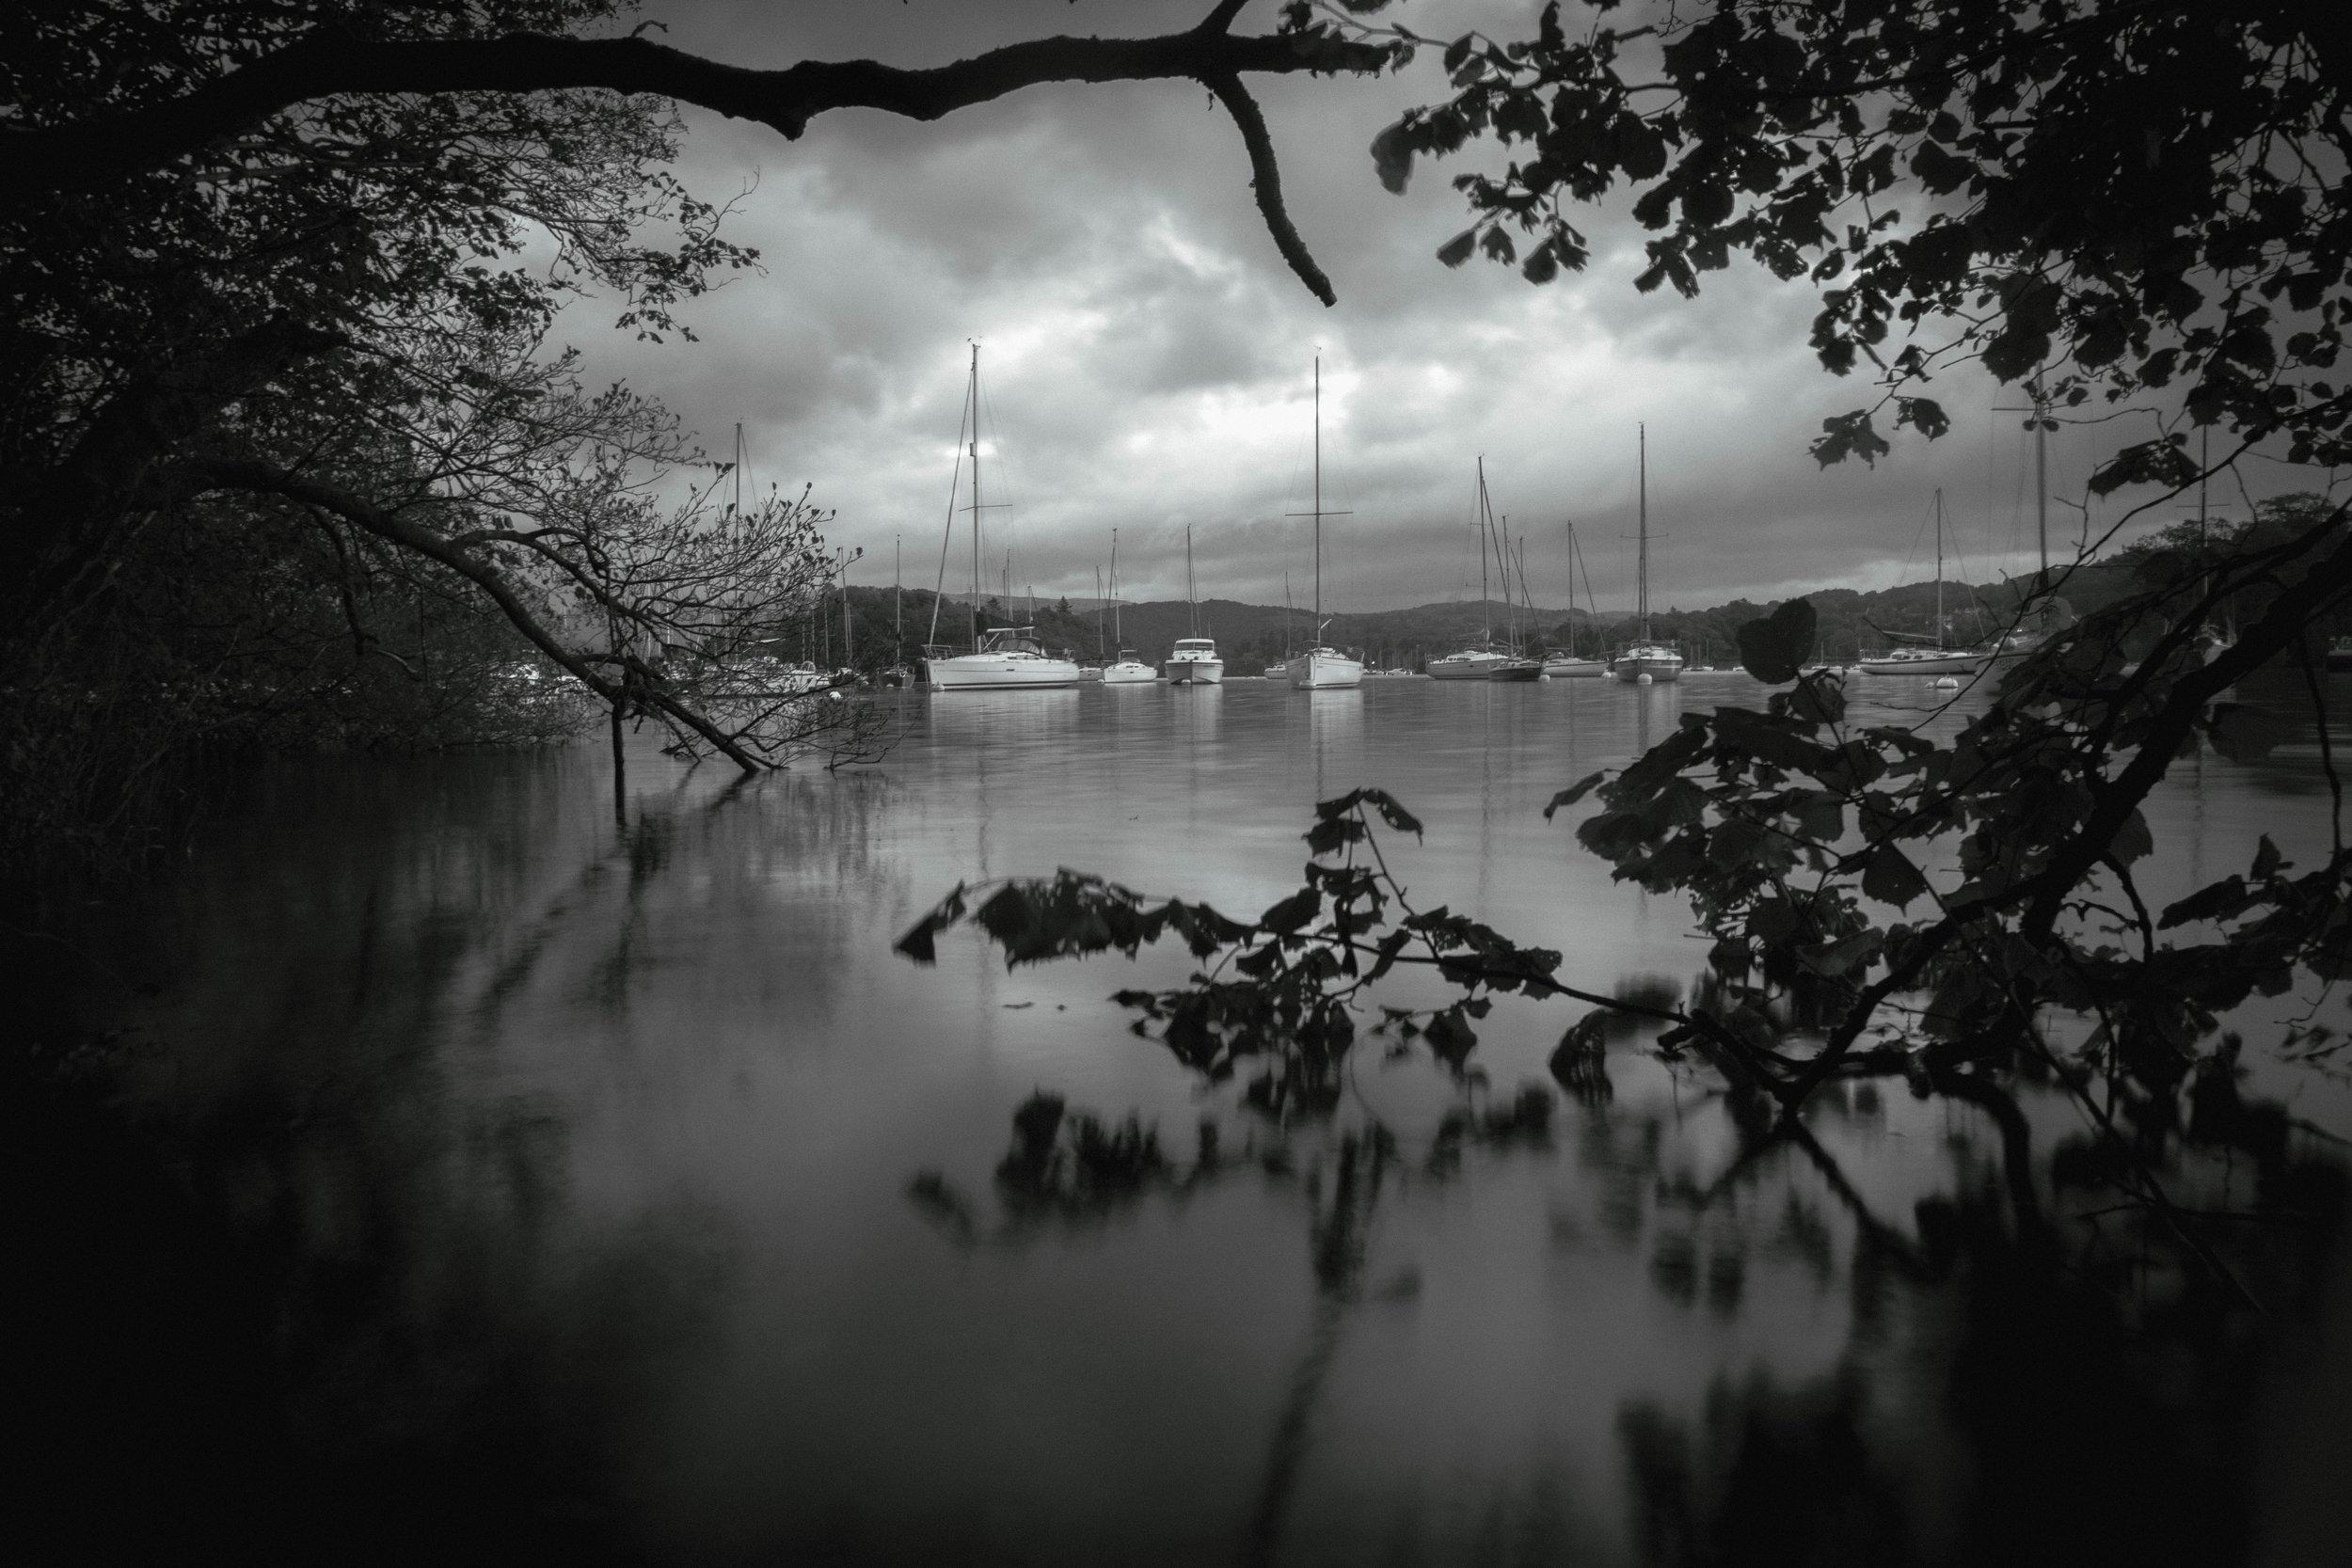 Lake-District-1.jpg